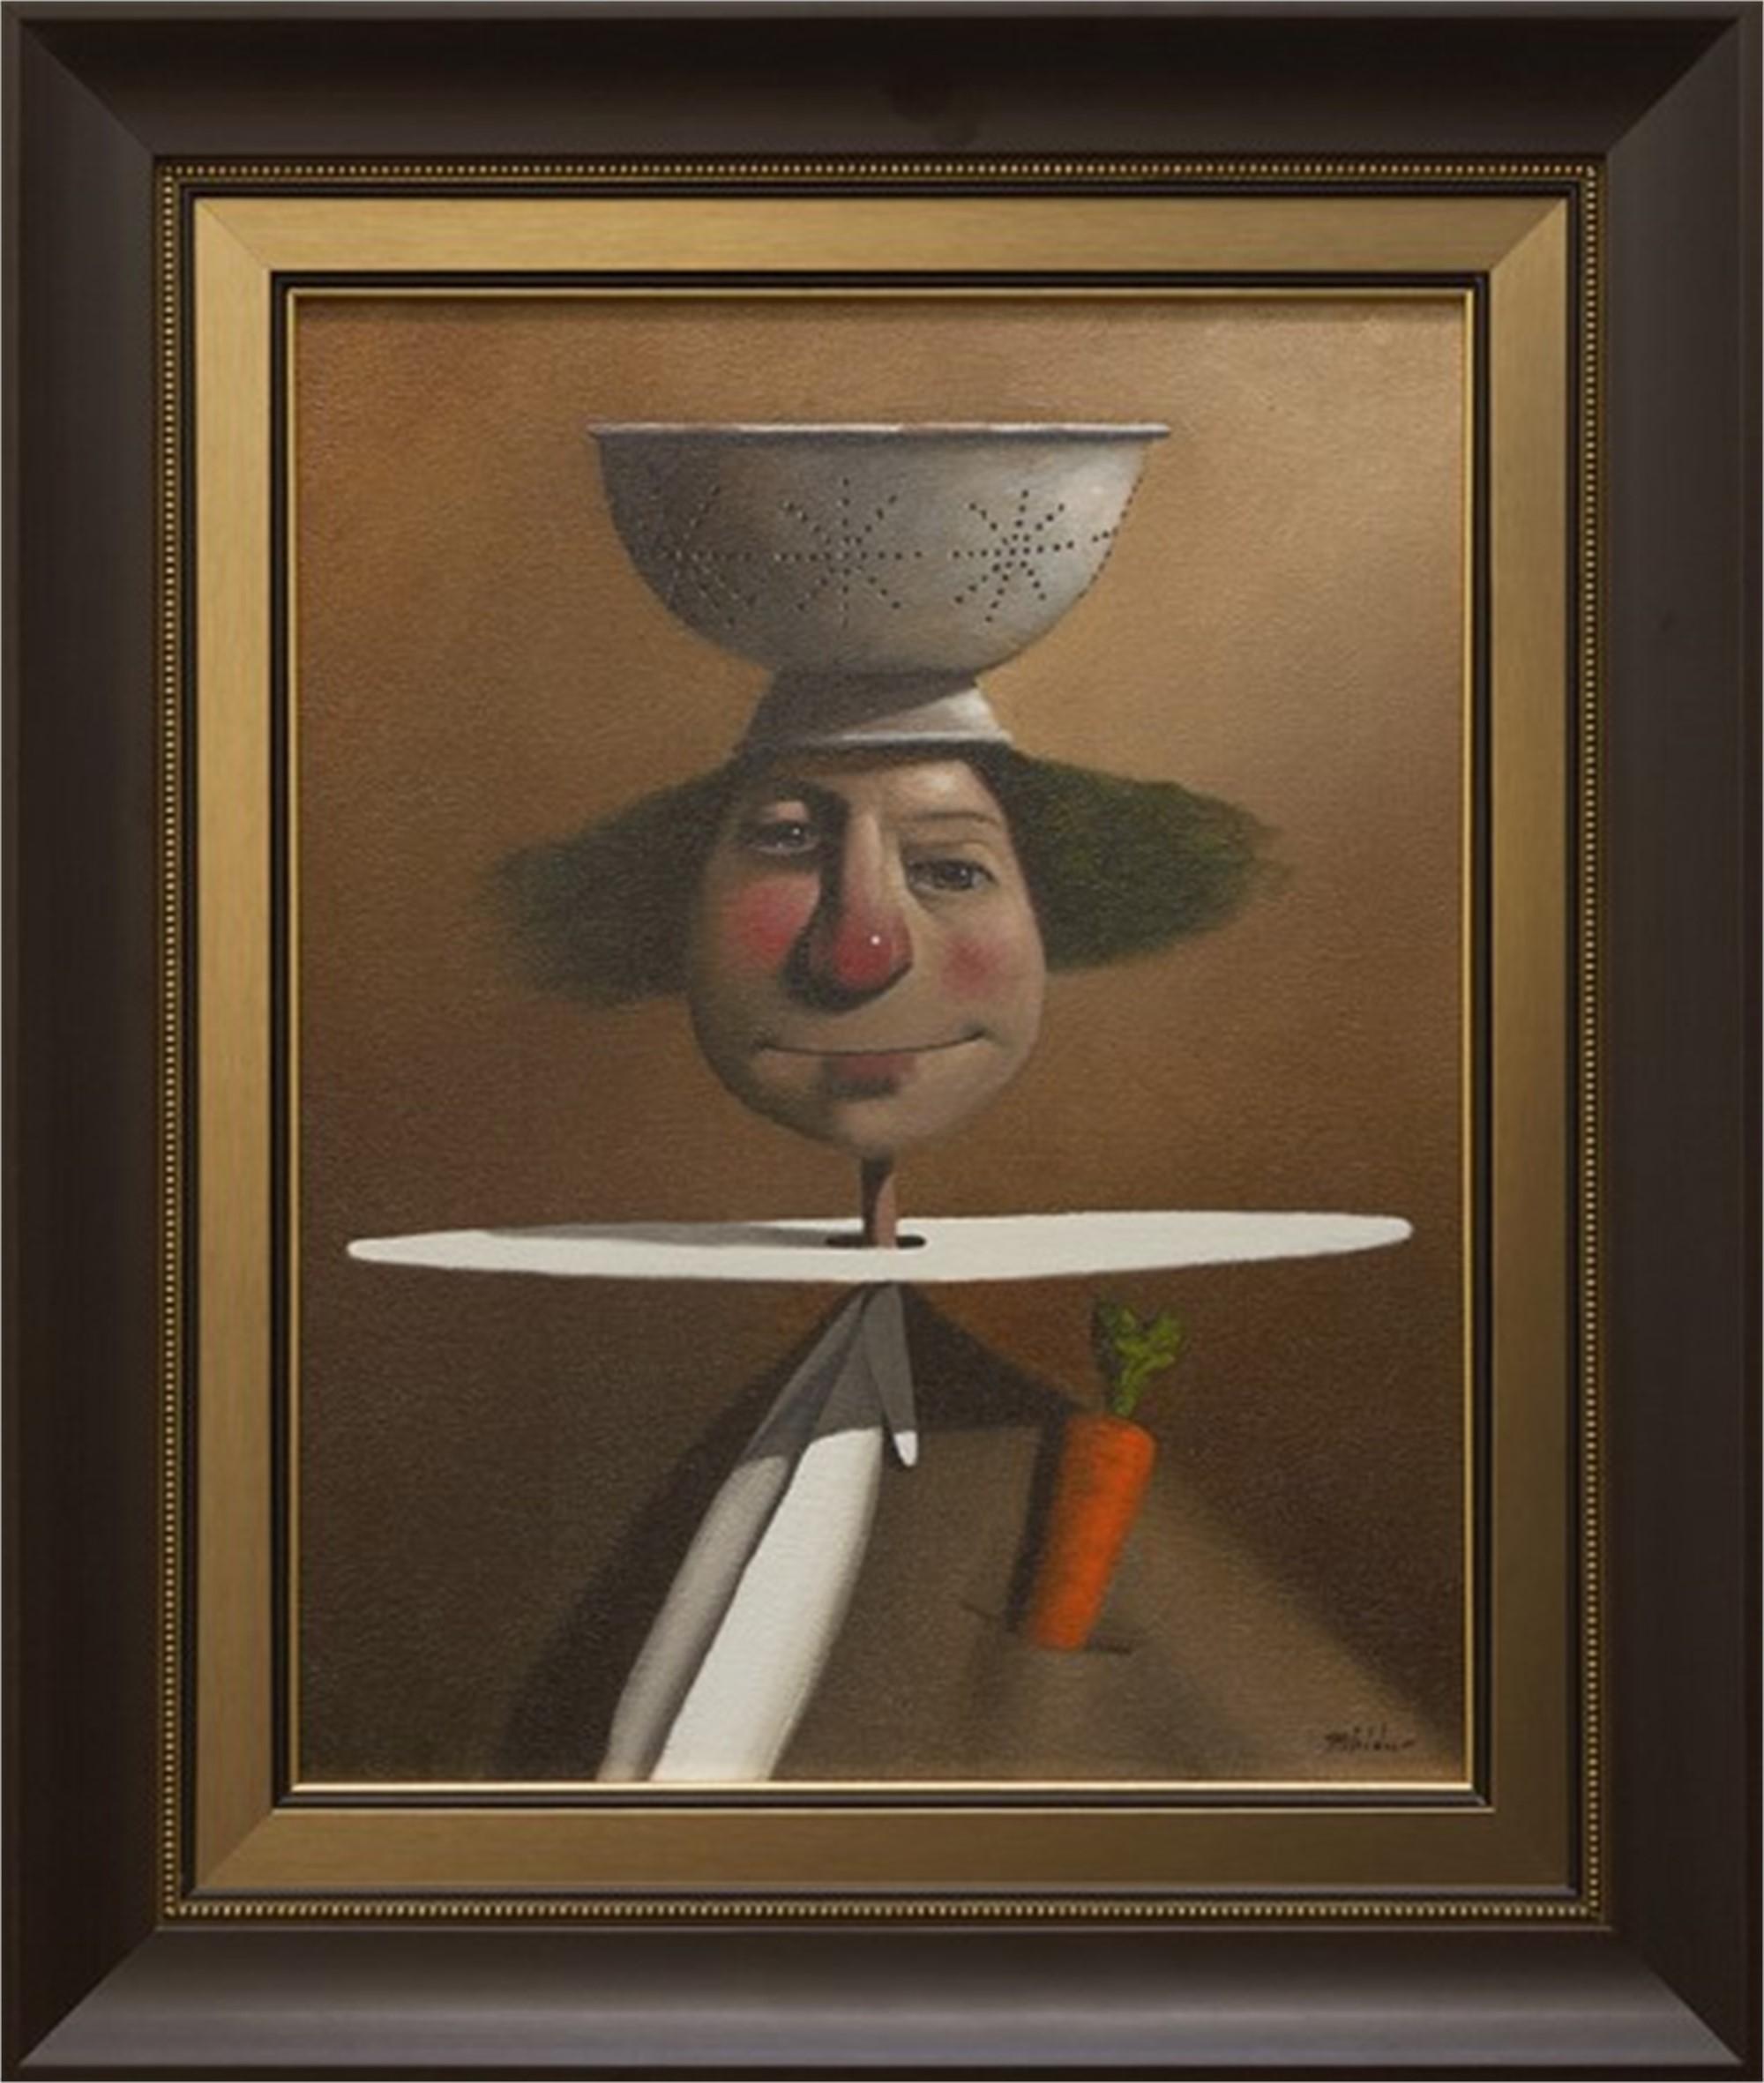 The Garmache by Joe McFadden